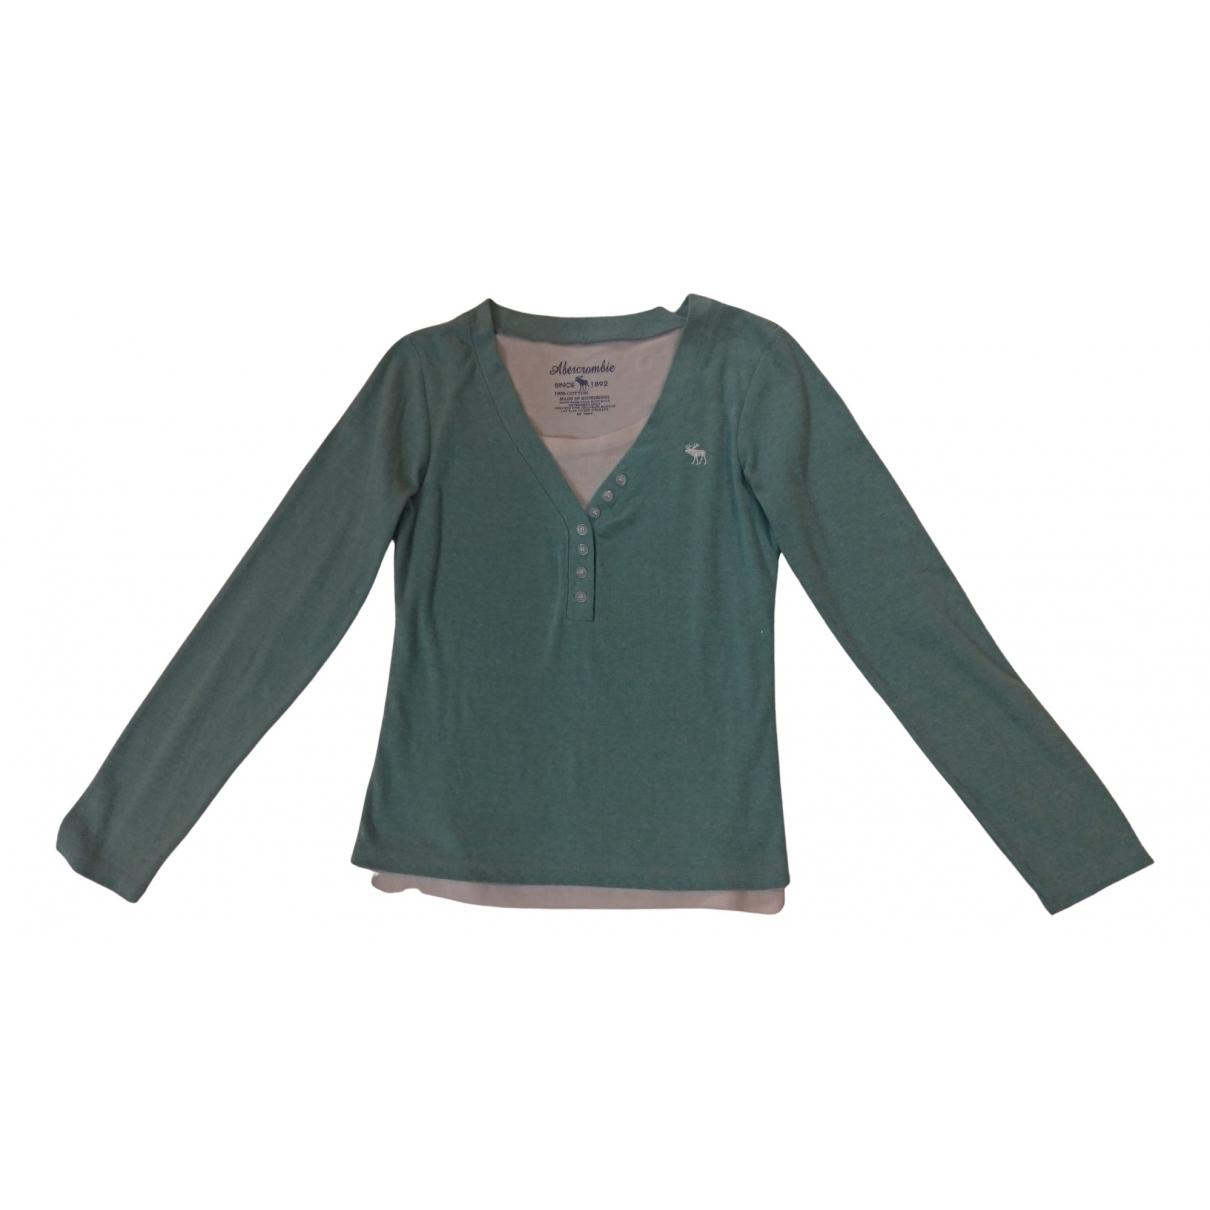 Abercrombie & Fitch \N Pullover in  Gruen Baumwolle